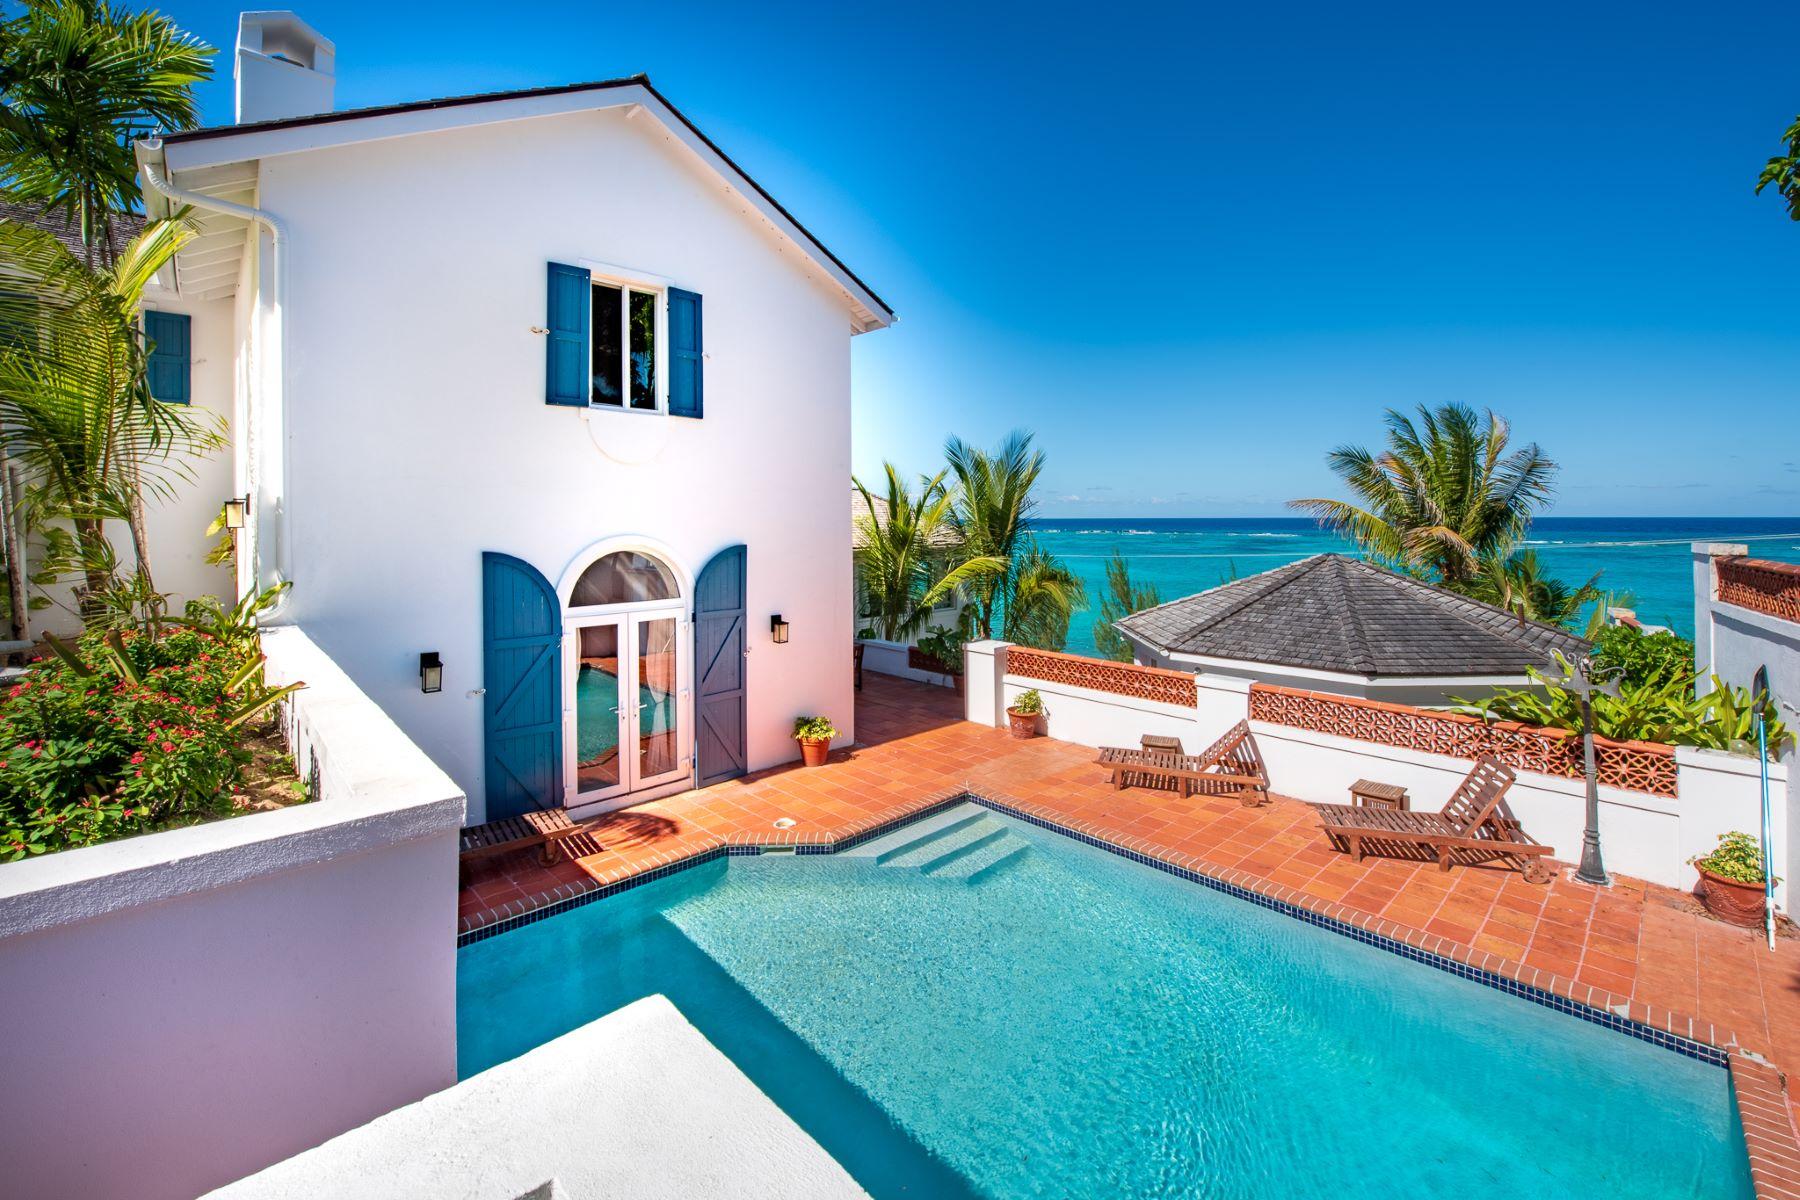 Single Family Home for Sale at Swinwood House #2 Compass Point, West Bay Street, Nassau And Paradise Island Bahamas